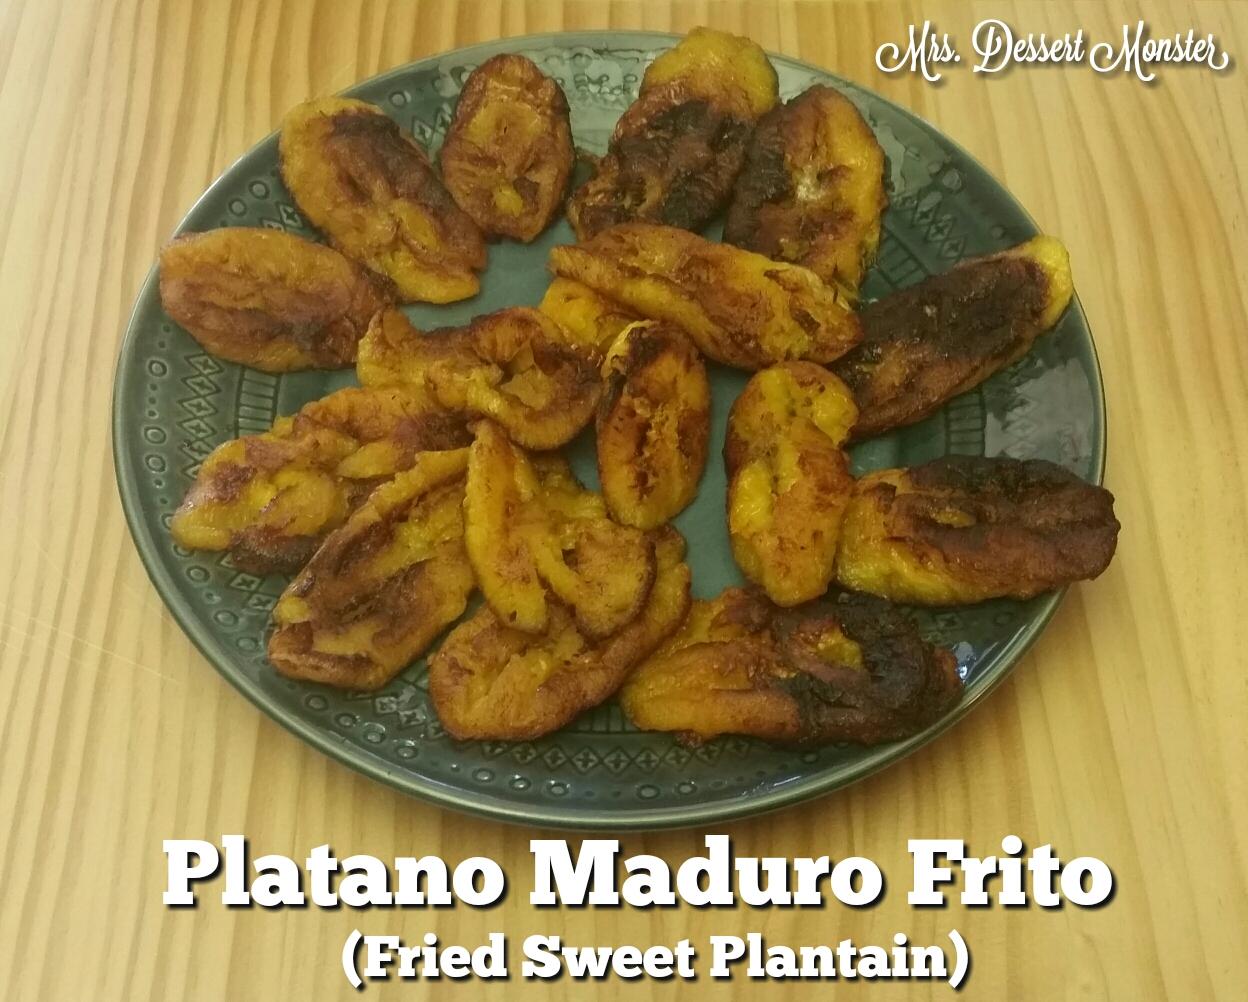 Platano Maduro Frito – Fried Sweet Plantain | Mrs. Dessert Monster